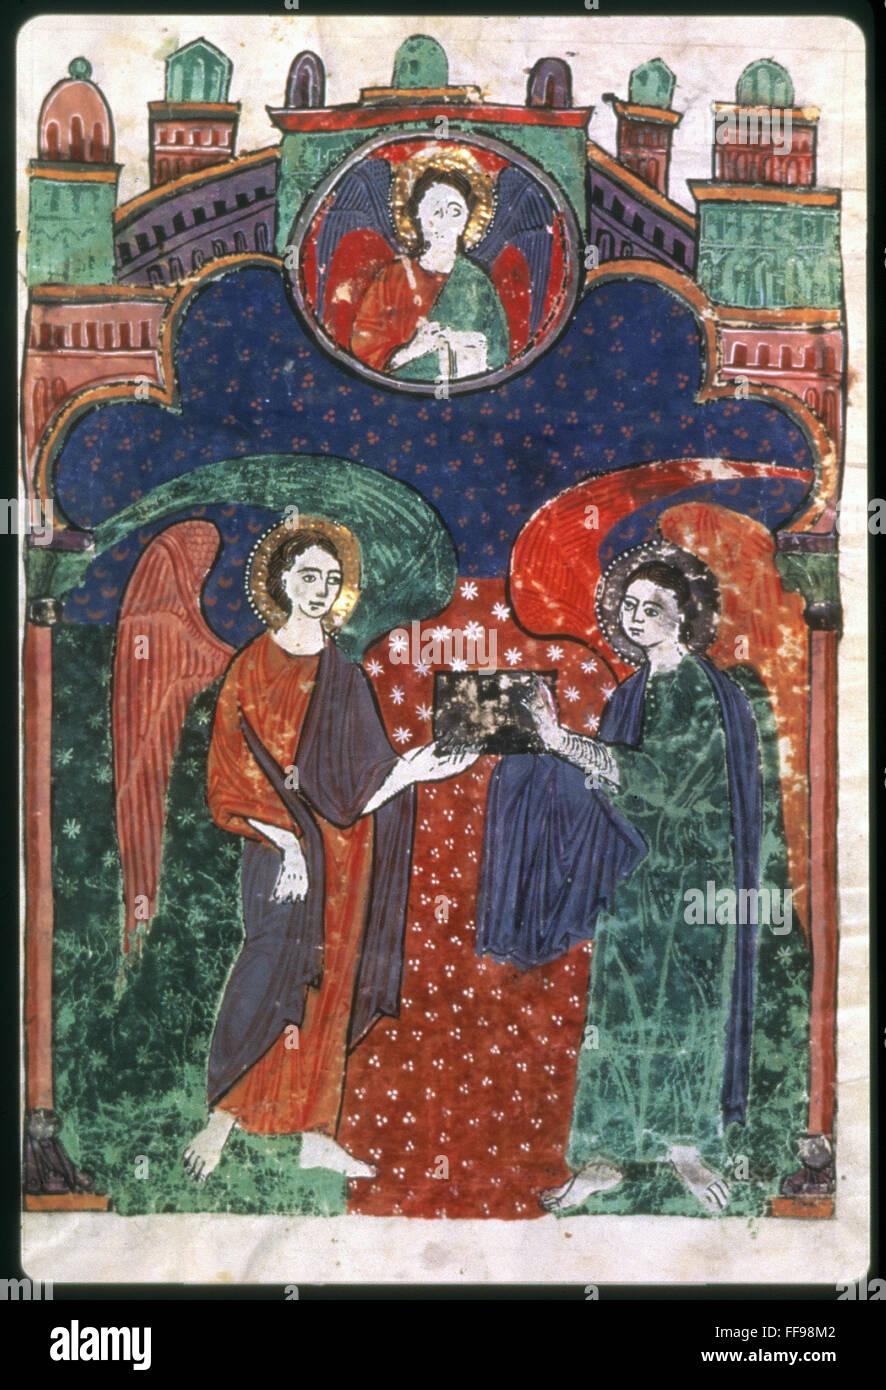 Angels holding gospels nbeneath a symbol of the apostle matthew angels holding gospels nbeneath a symbol of the apostle matthew spanish manuscript illumination 1220 biocorpaavc